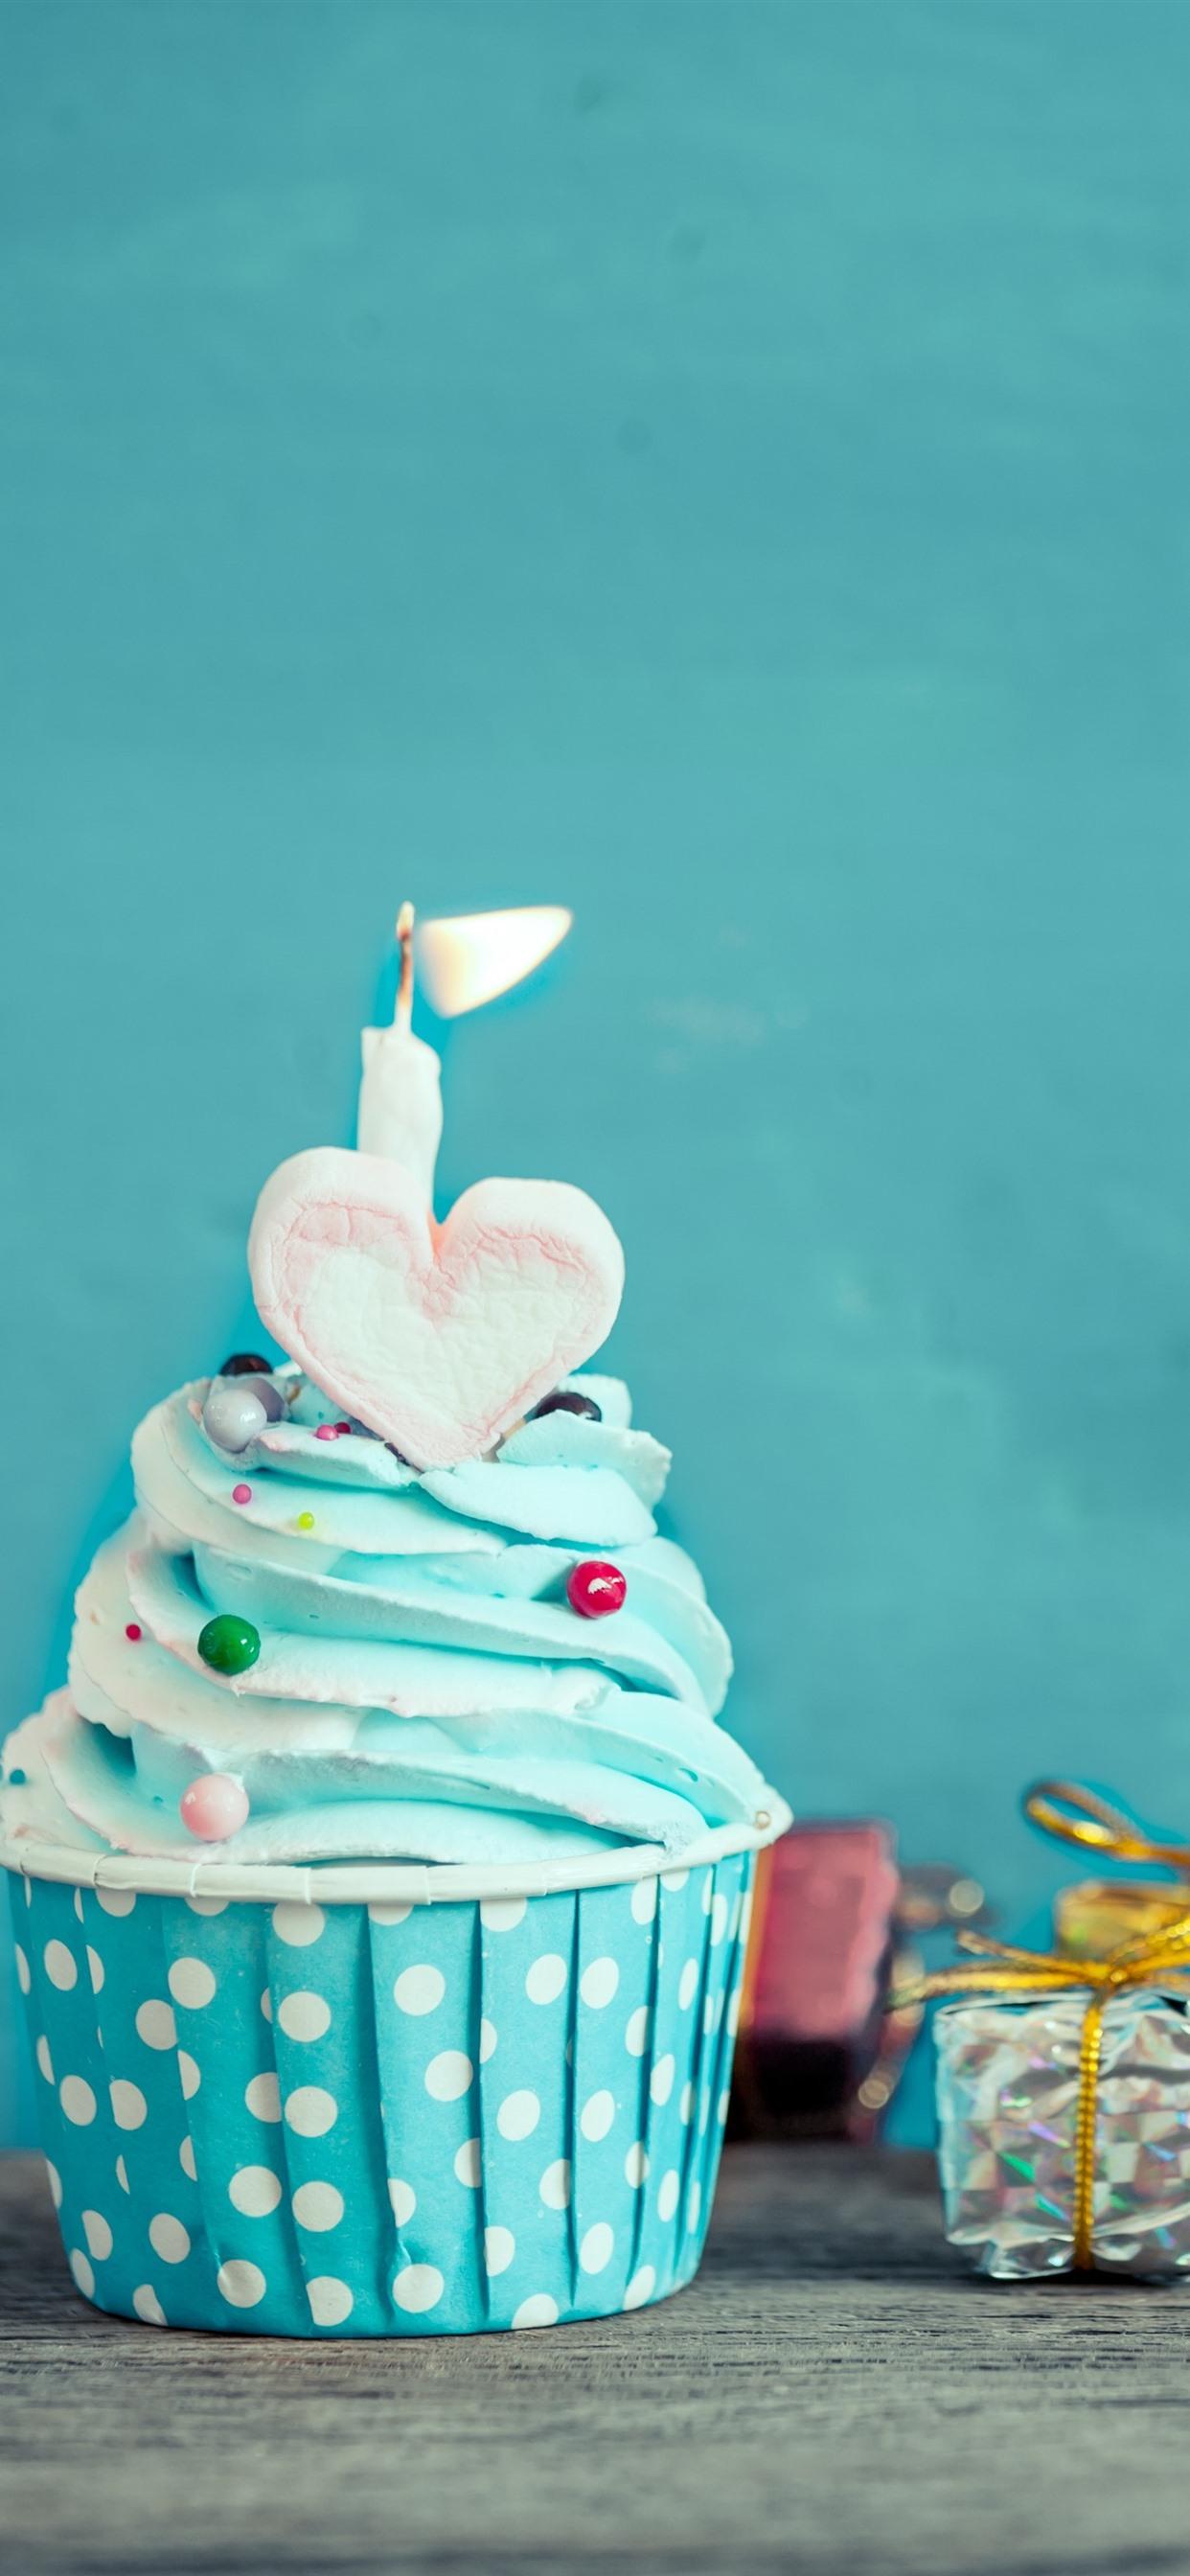 Astonishing Birthday Cake Blue Cream Candle Love Heart Ts 1242X2688 Funny Birthday Cards Online Aeocydamsfinfo